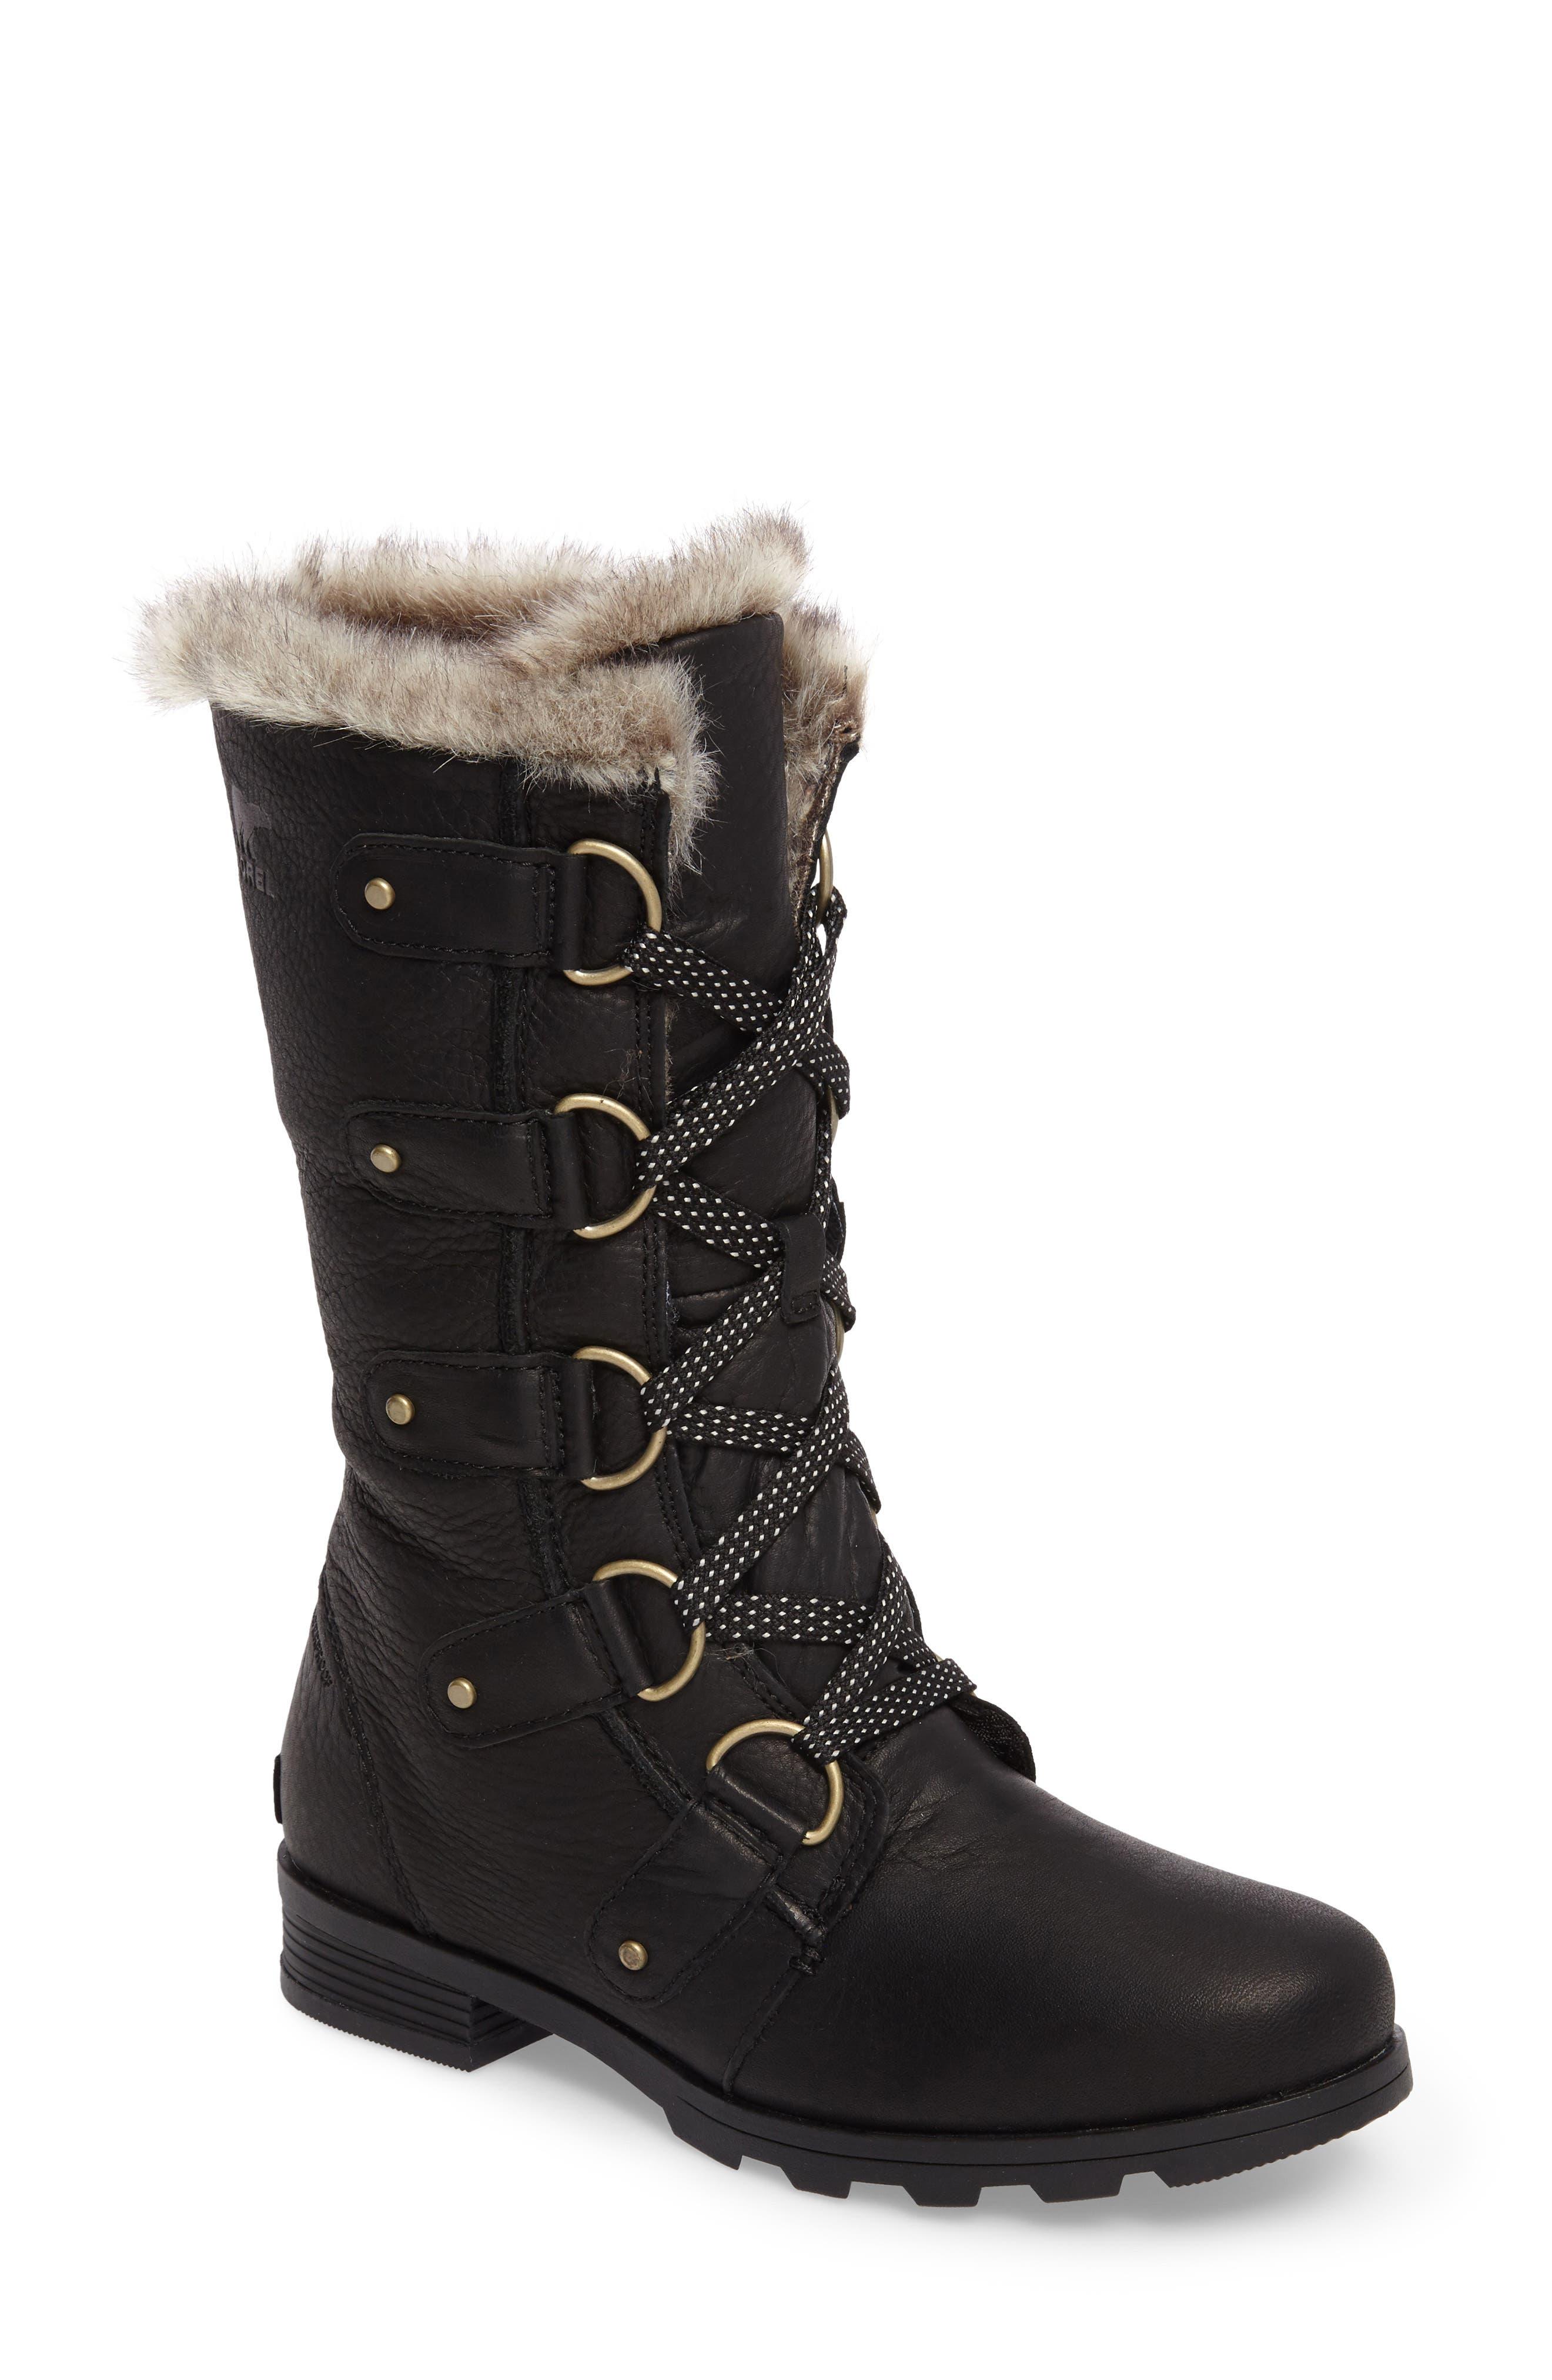 Emelie Waterproof Lace Up Boot with Faux Fur Trim,                             Main thumbnail 1, color,                             Black